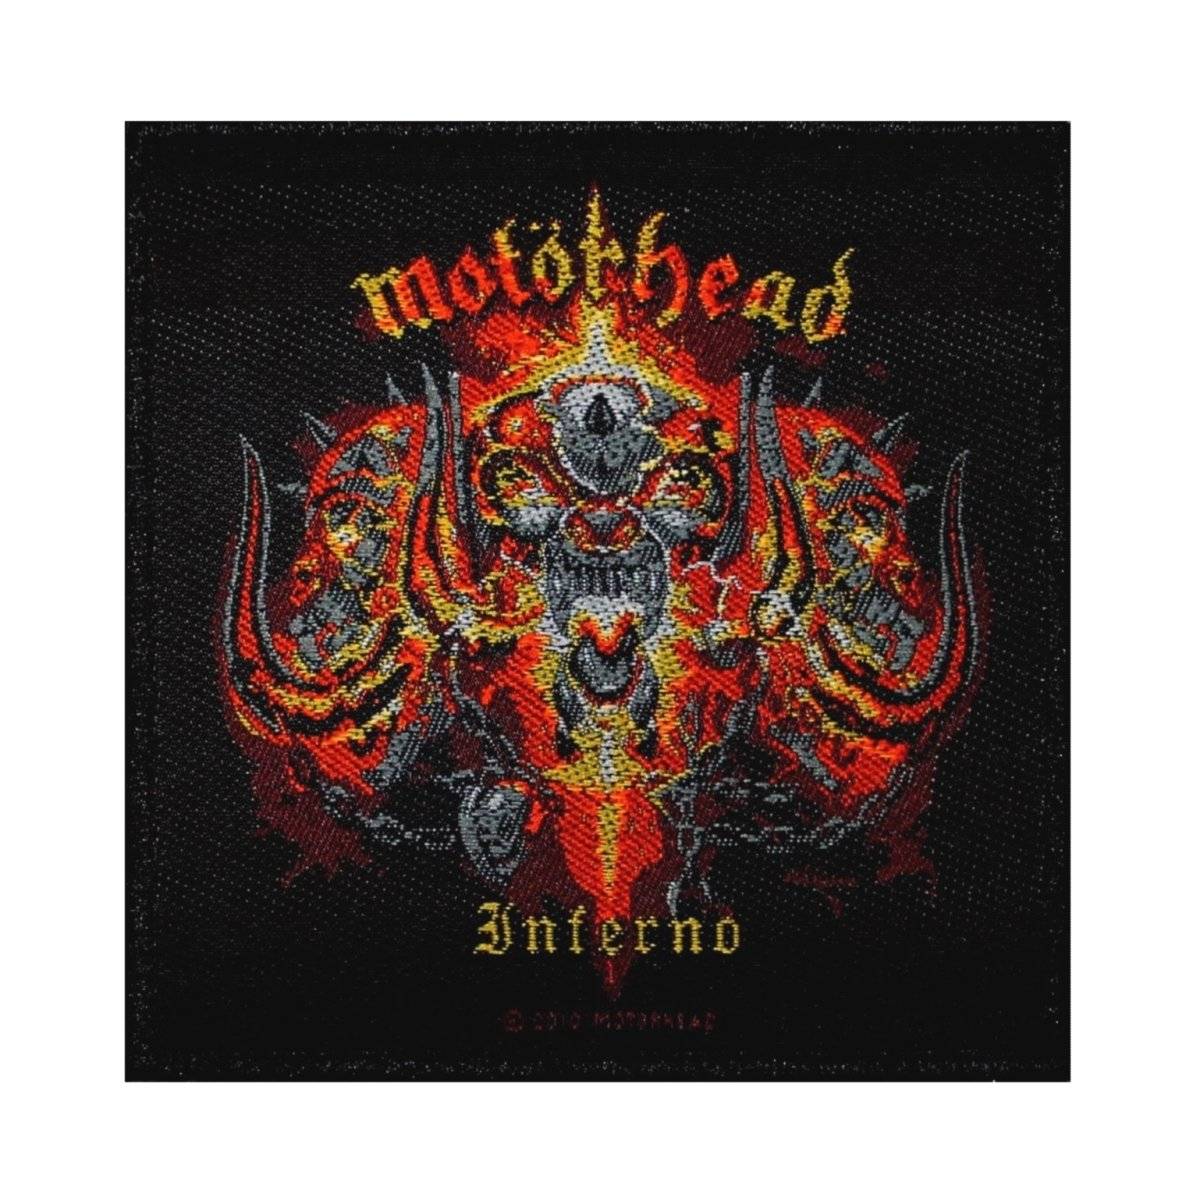 CD Review: MotorheadInferno naked (91 photos)